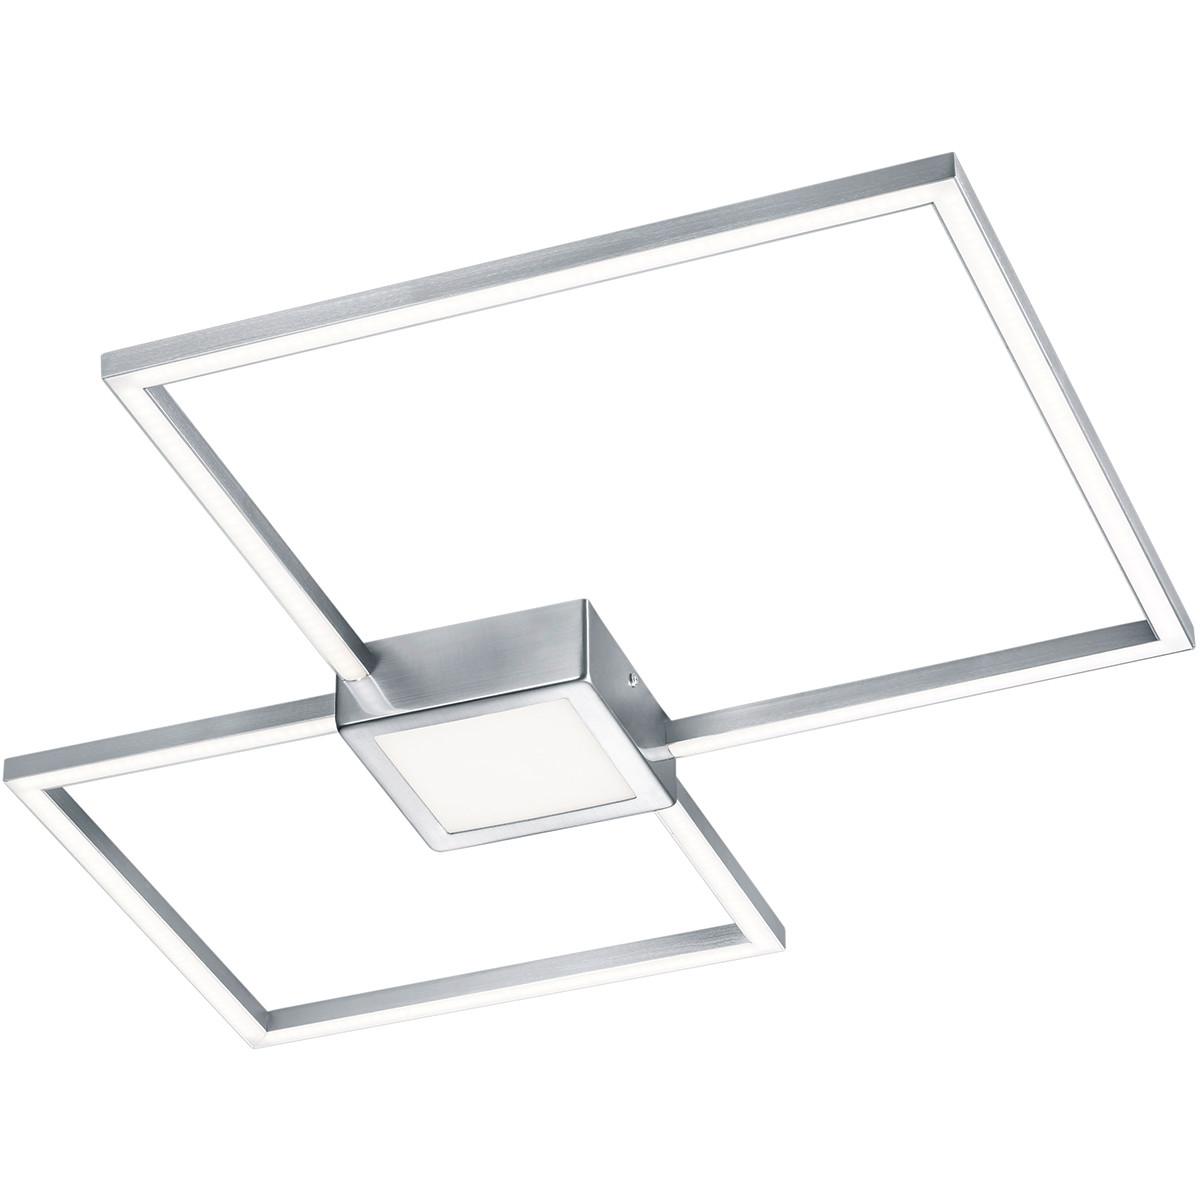 LED Plafondlamp - Trion Hydro - 28W - Warm Wit 3000K - Dimbaar - Rechthoek - Mat Nikkel - Aluminium